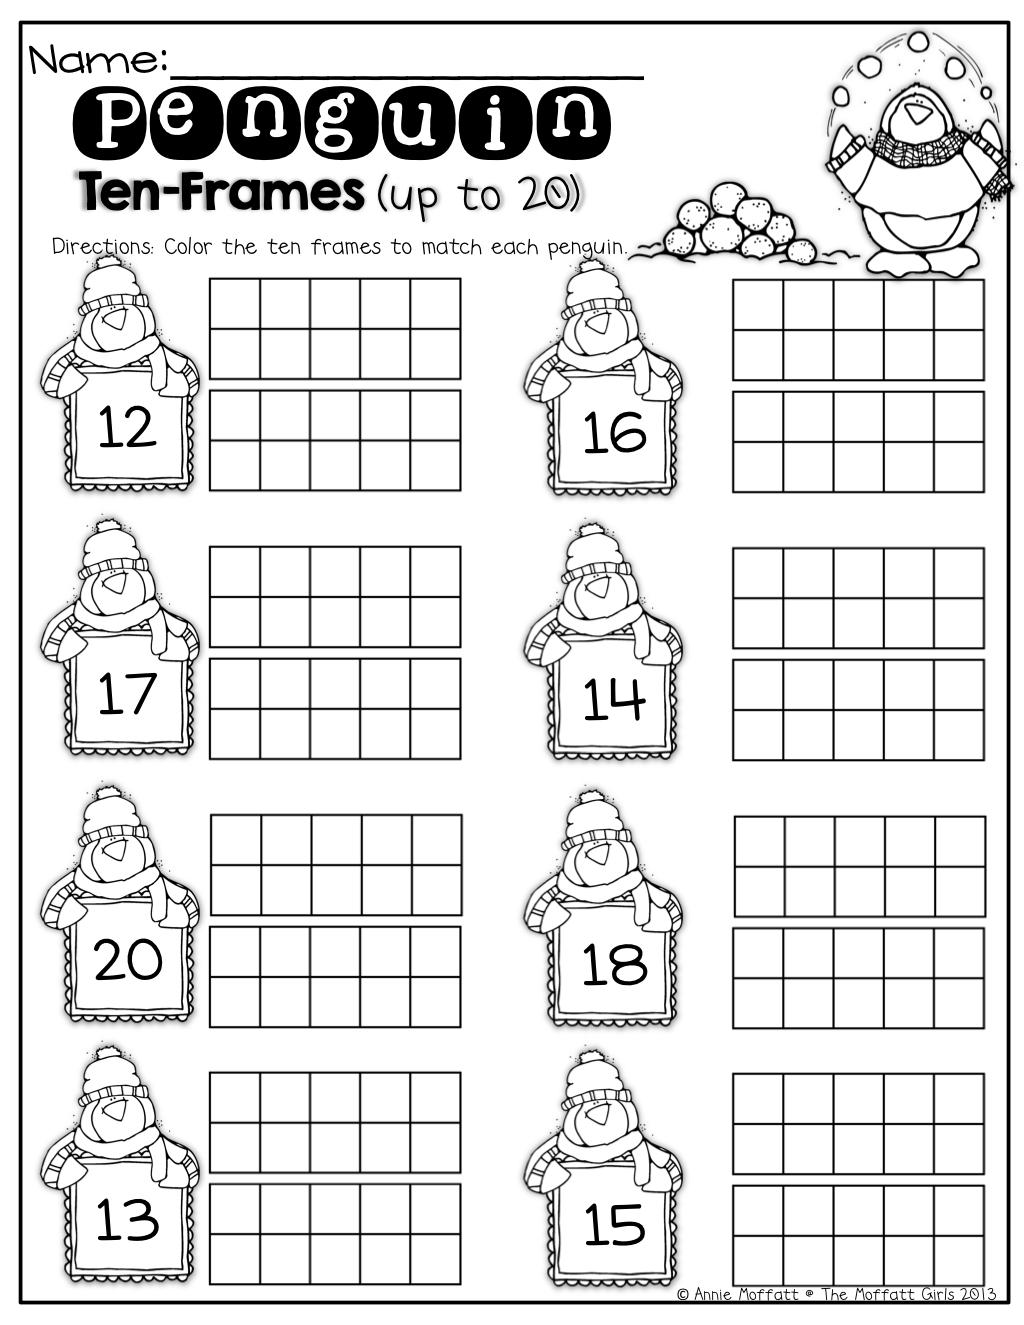 Penguin Ten Frames up to 20! | Sayılar | Pinterest | Winter, Kind ...